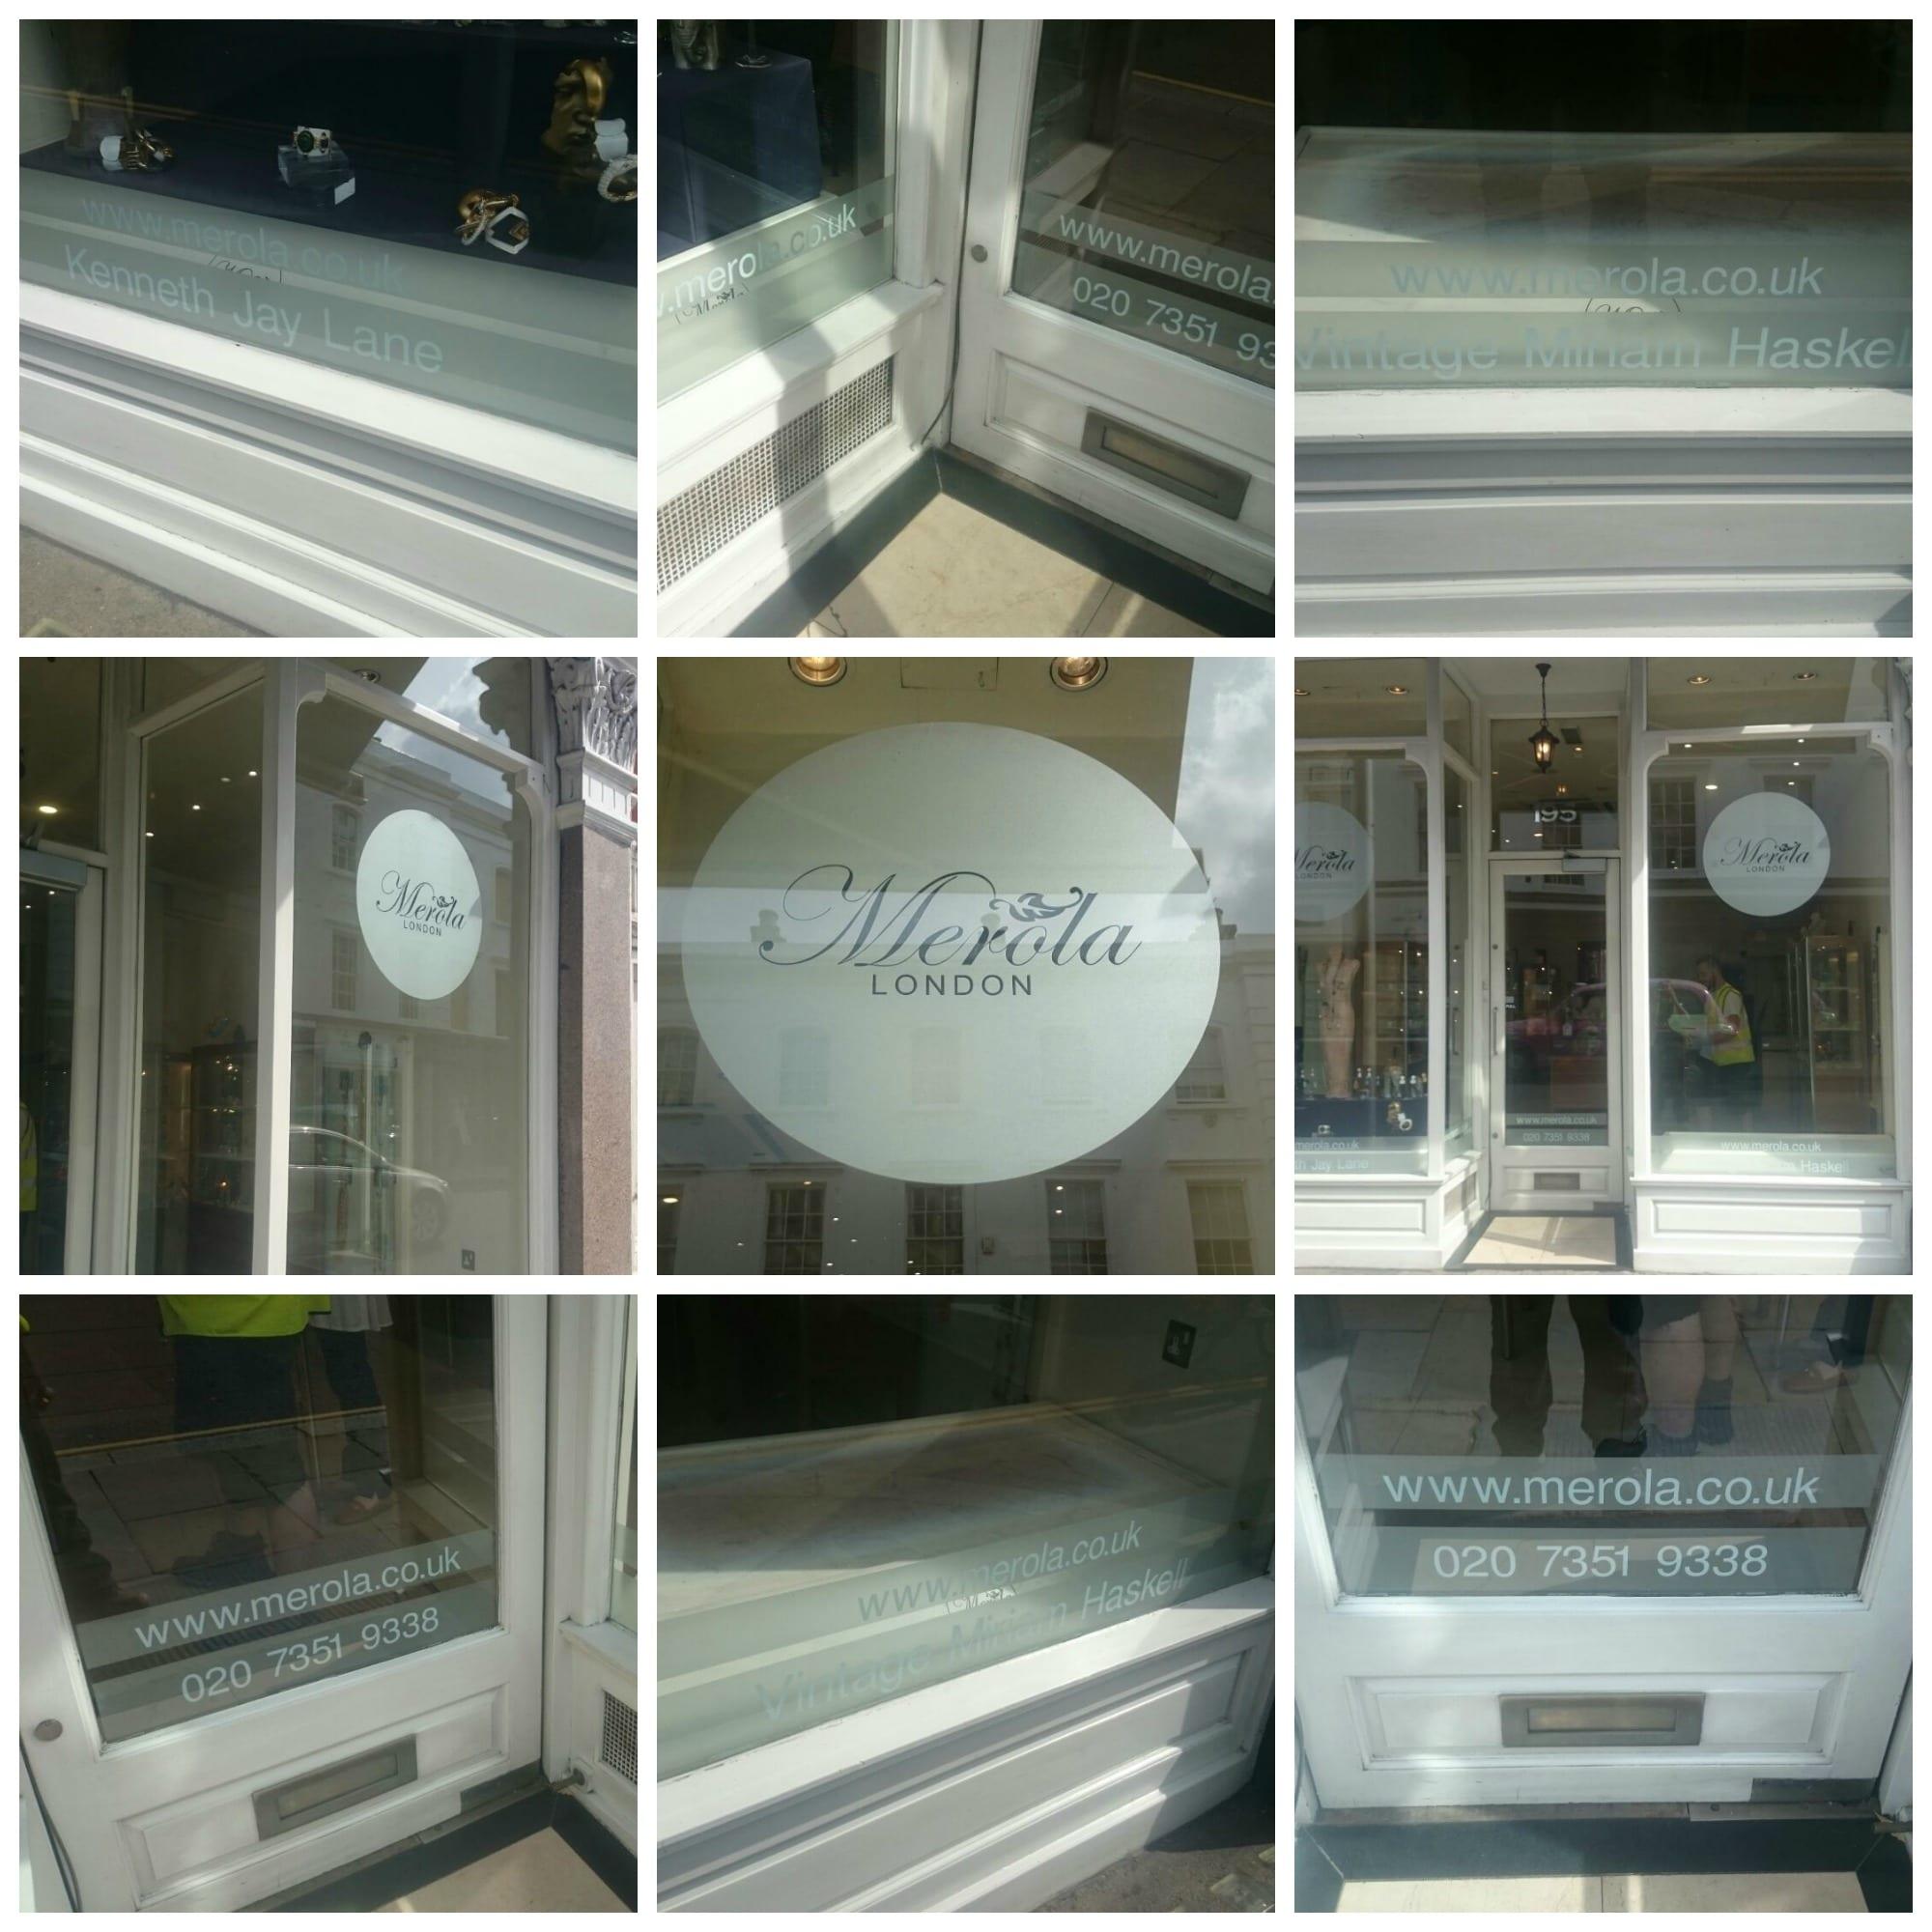 Merola Jewellery Fulham Raod South West vinyl window graphics